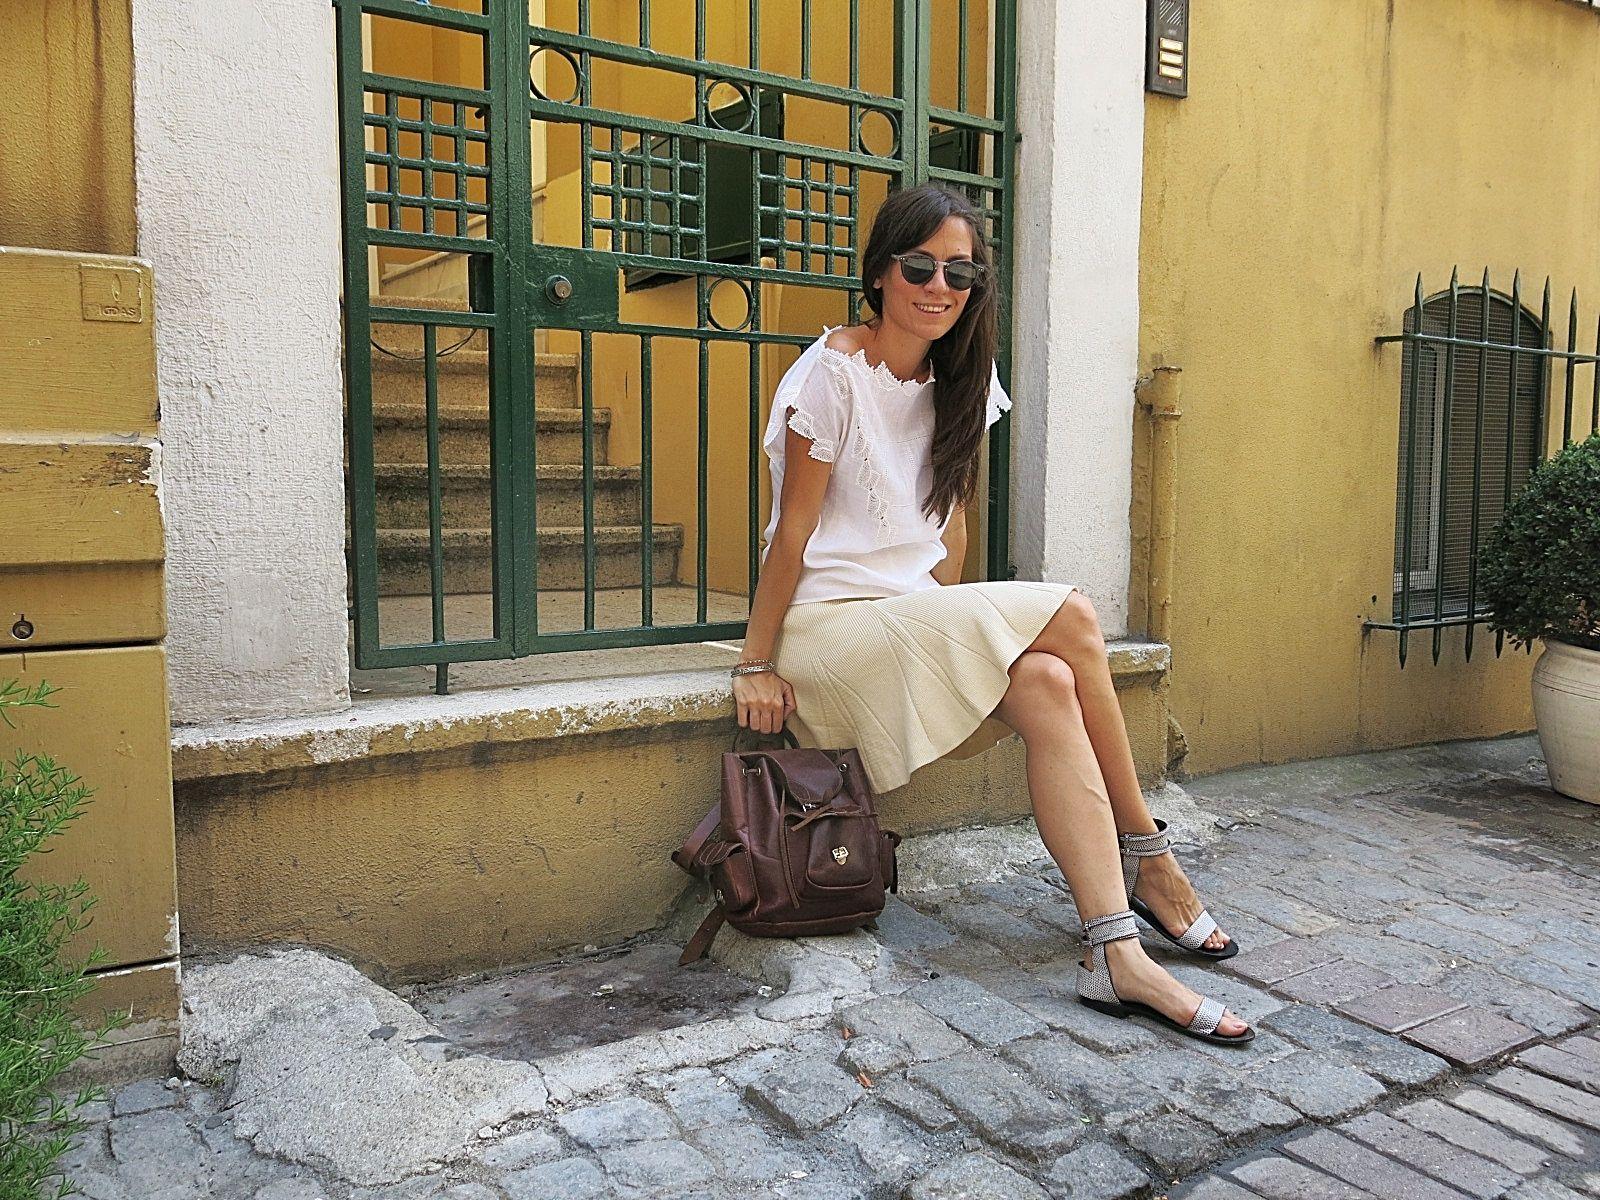 off ne giysem, outfit, street style